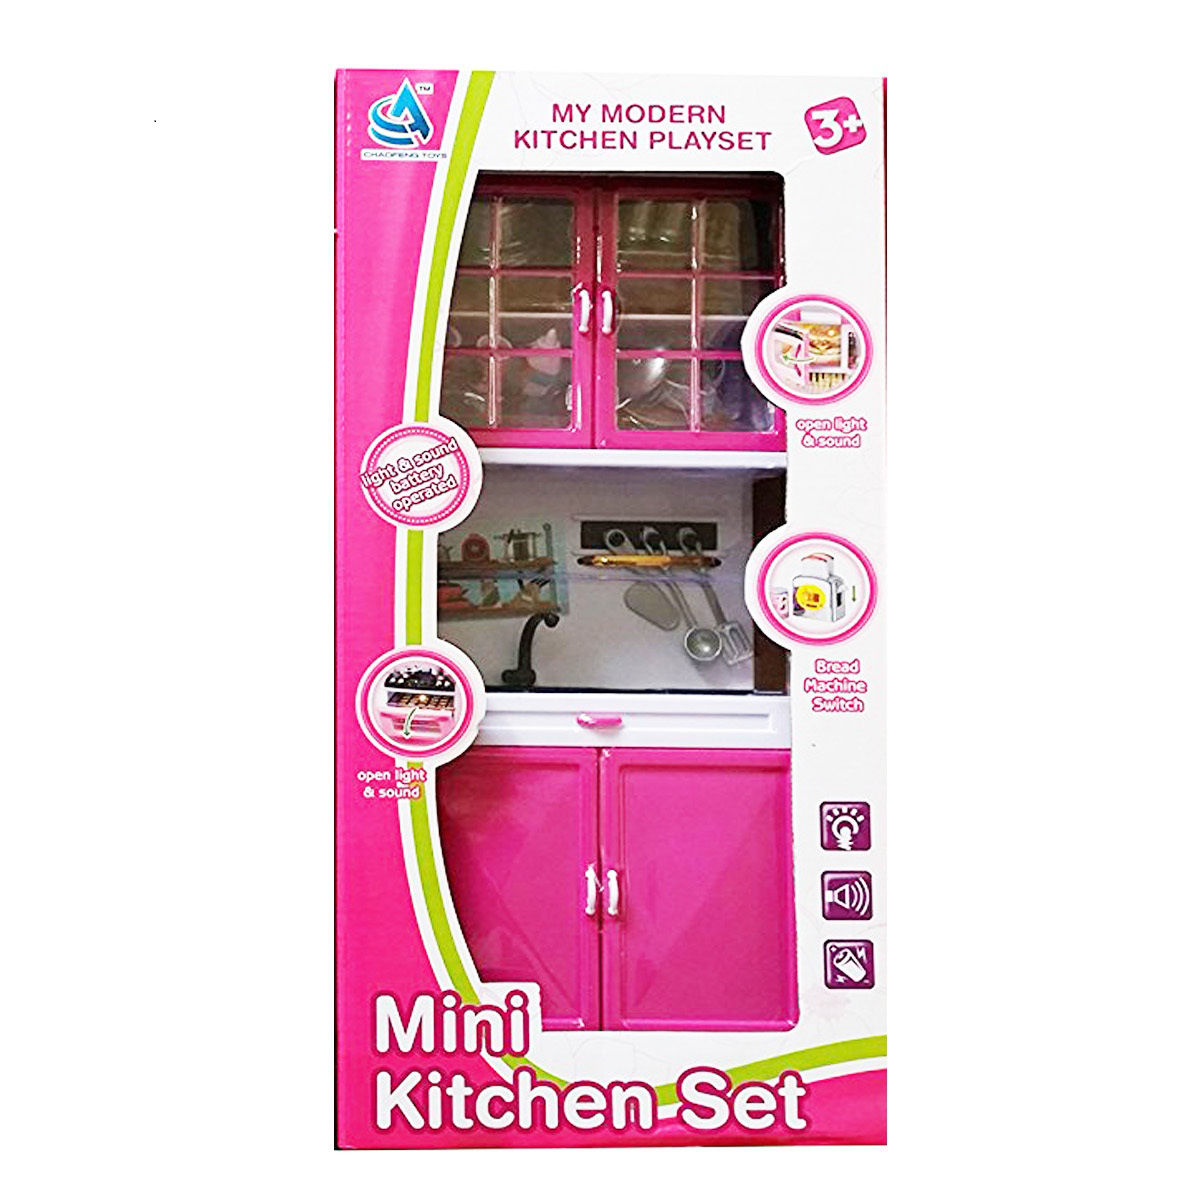 Hopscotch toy jumble kitchen set toys with battery operating